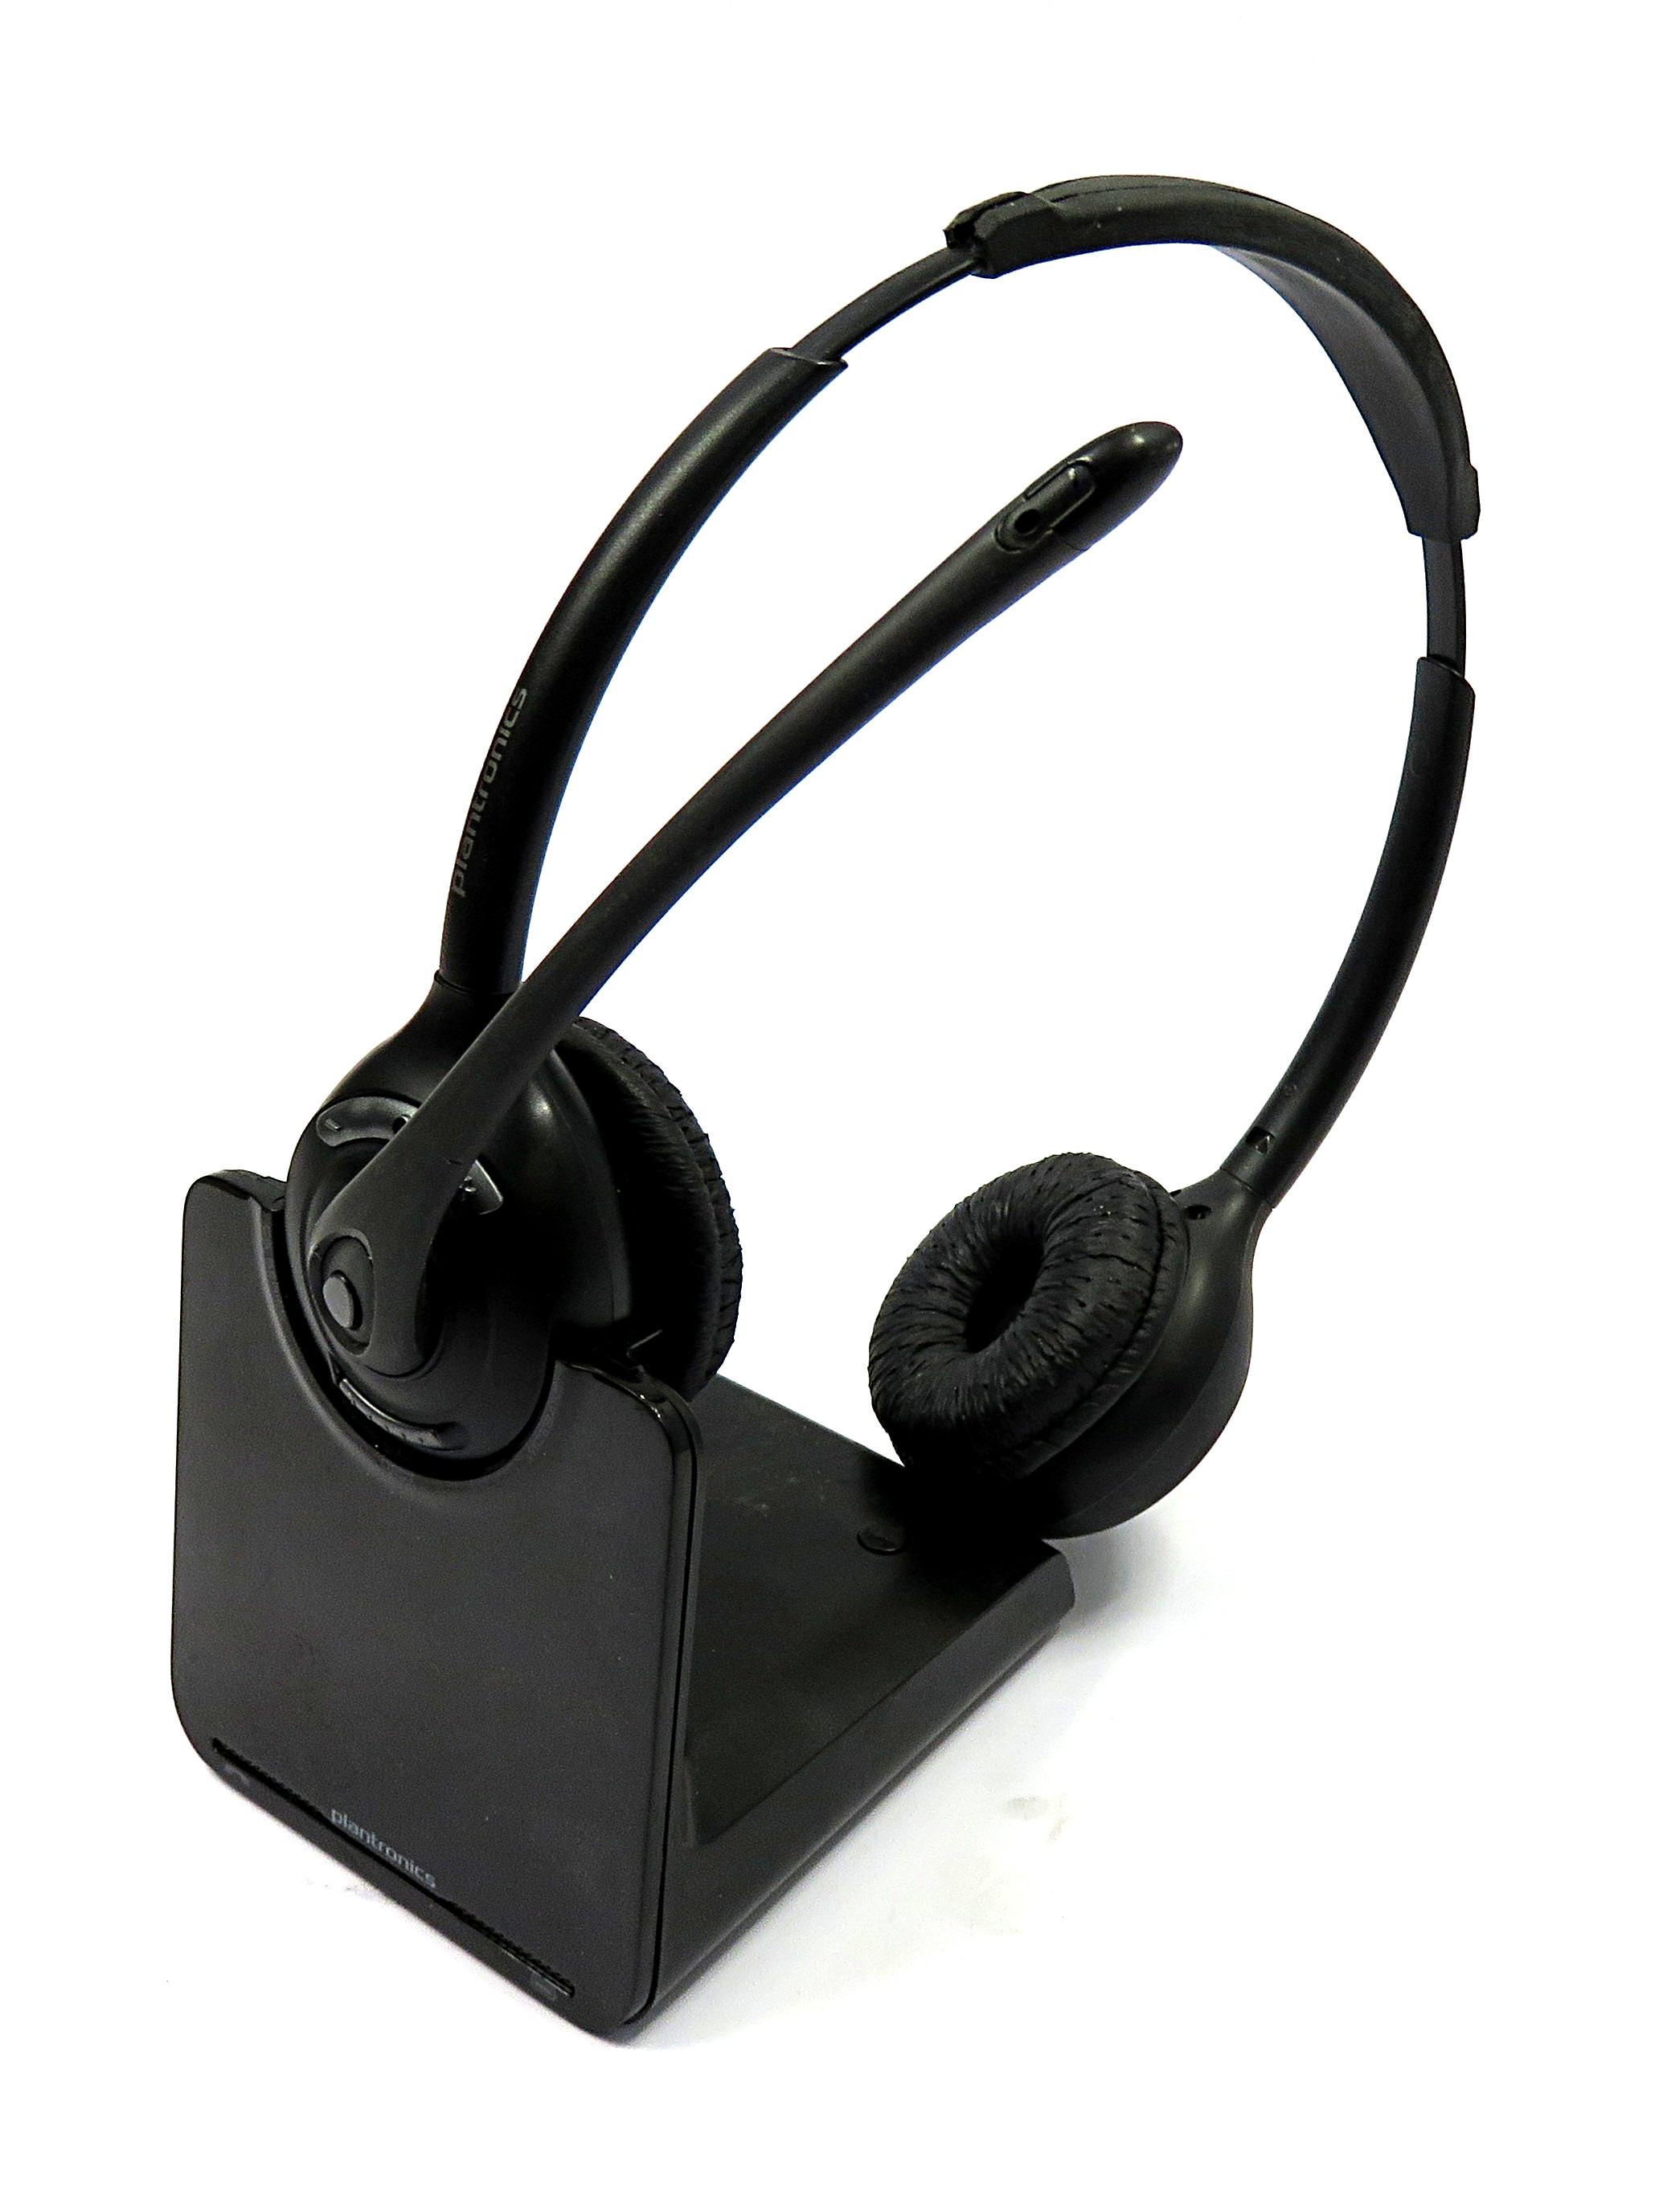 Cs520 wireless Binaural headset manual